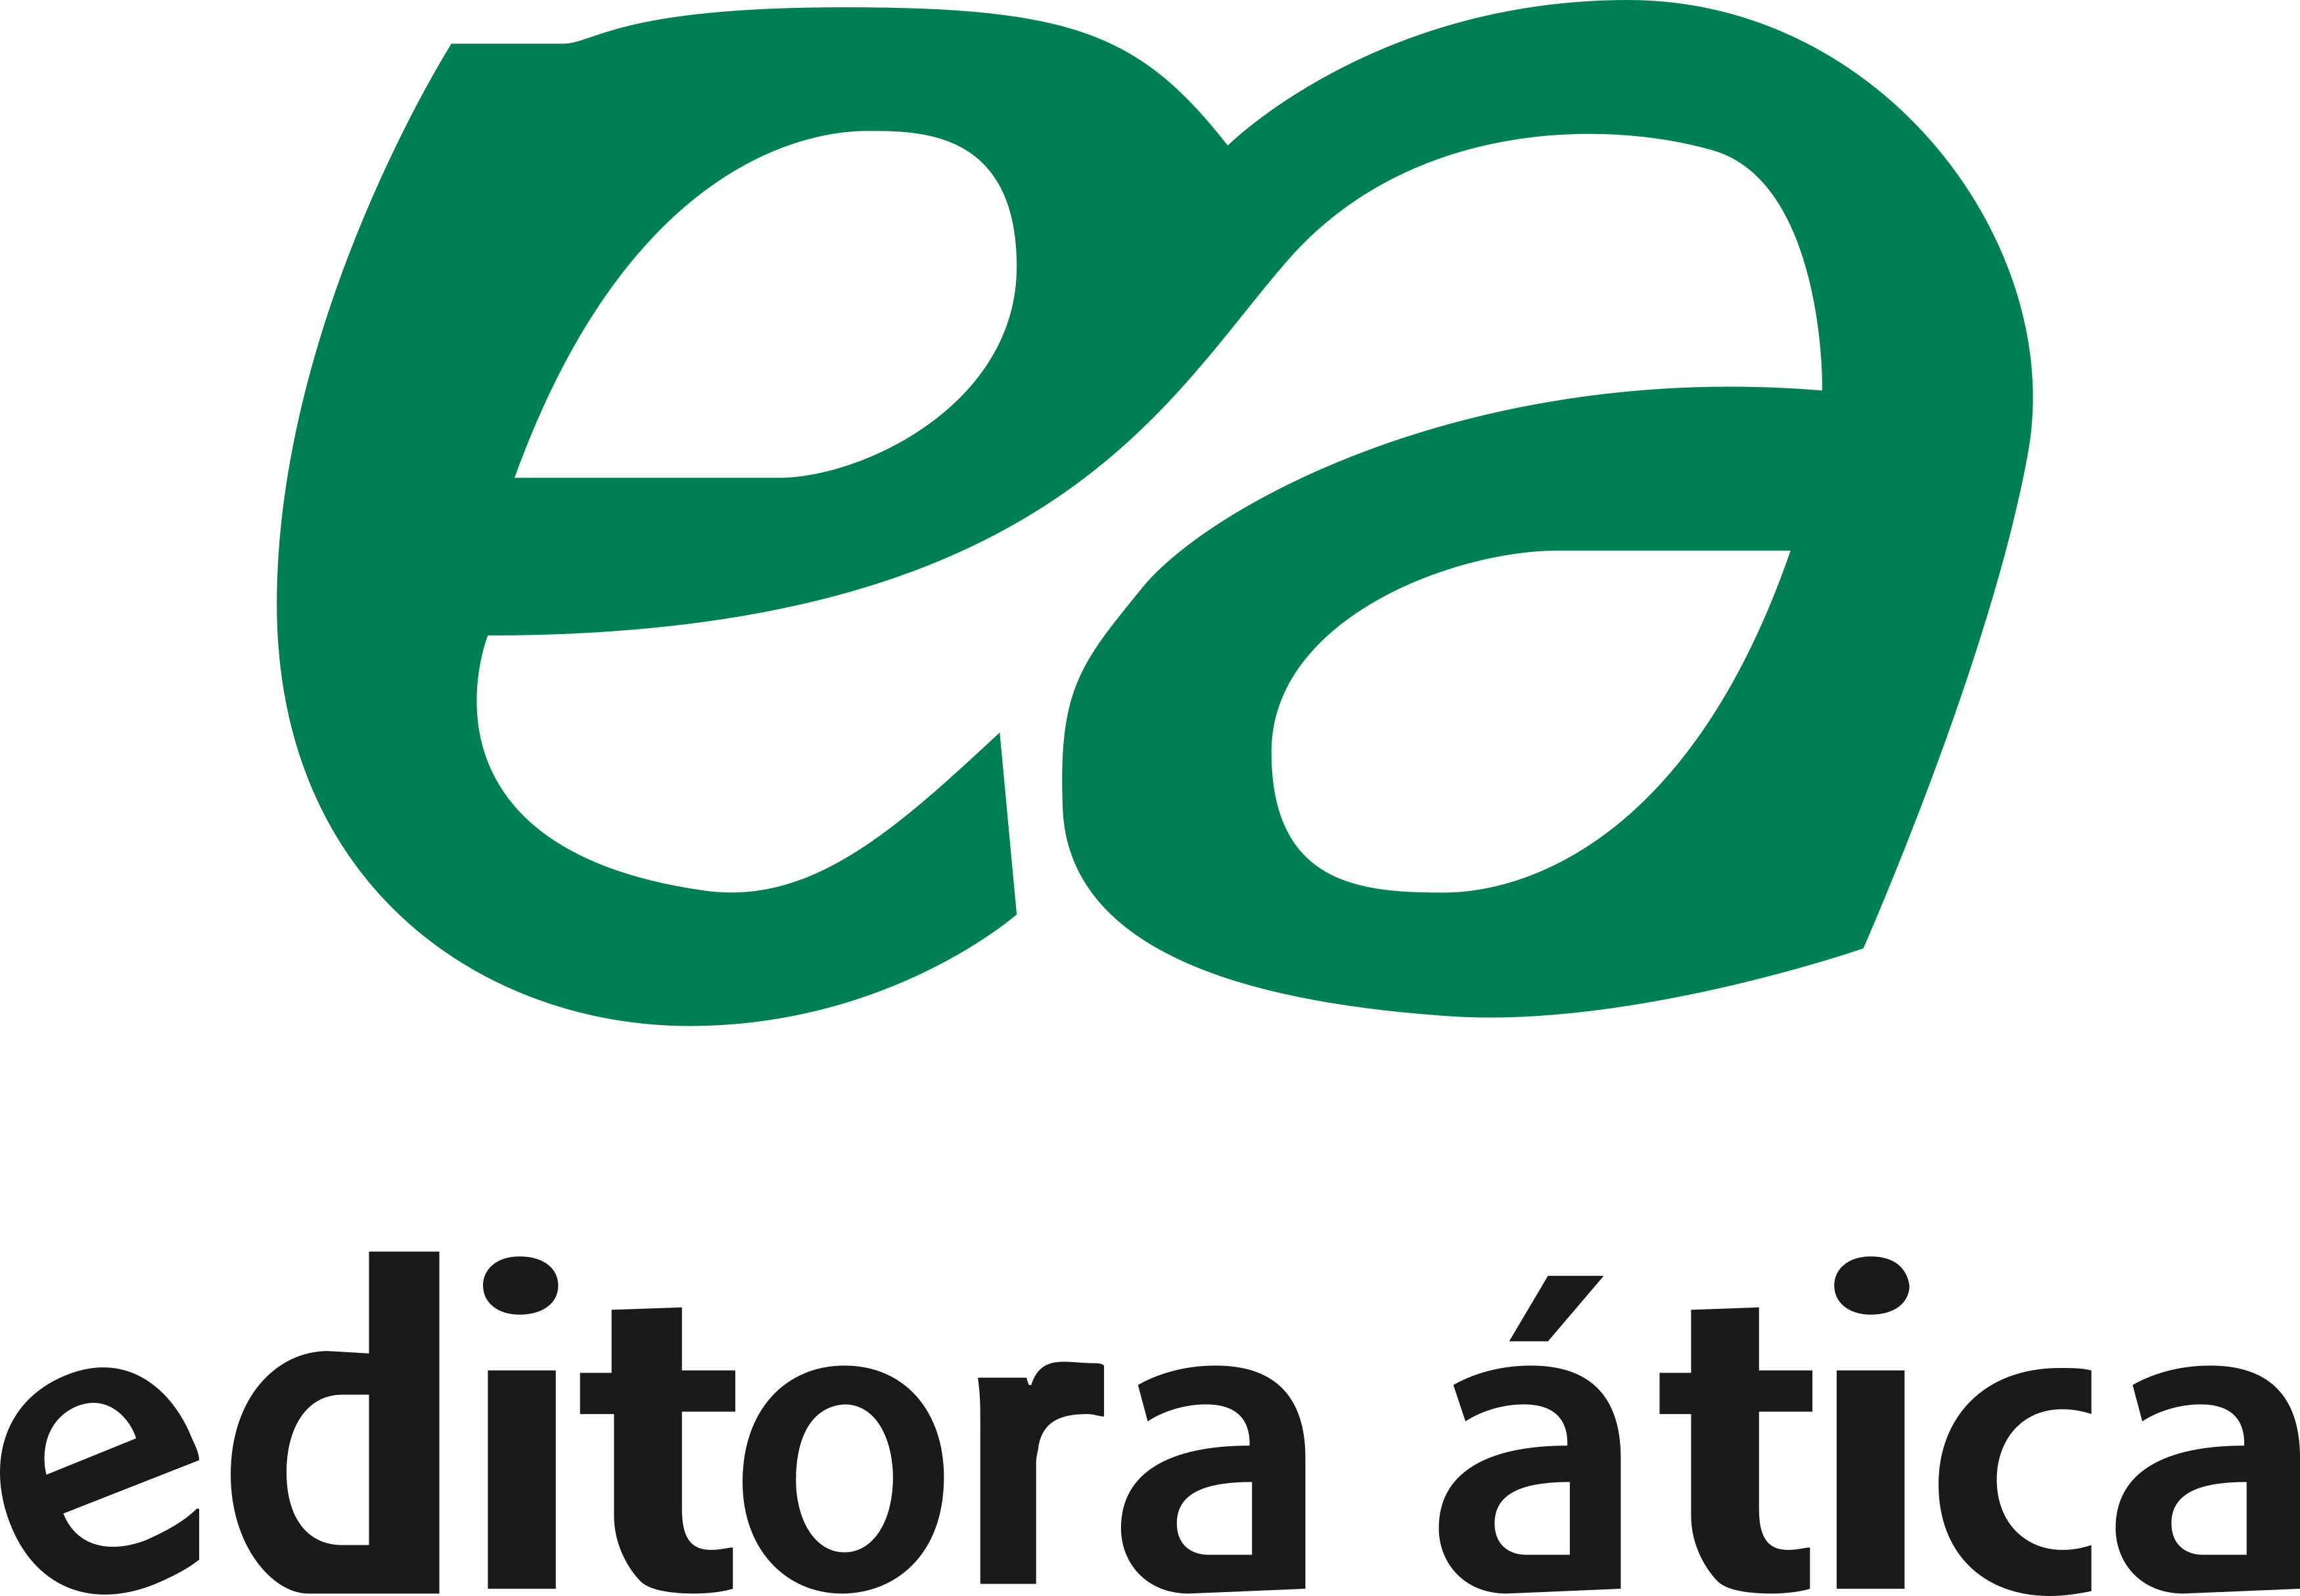 Editora ática logo.